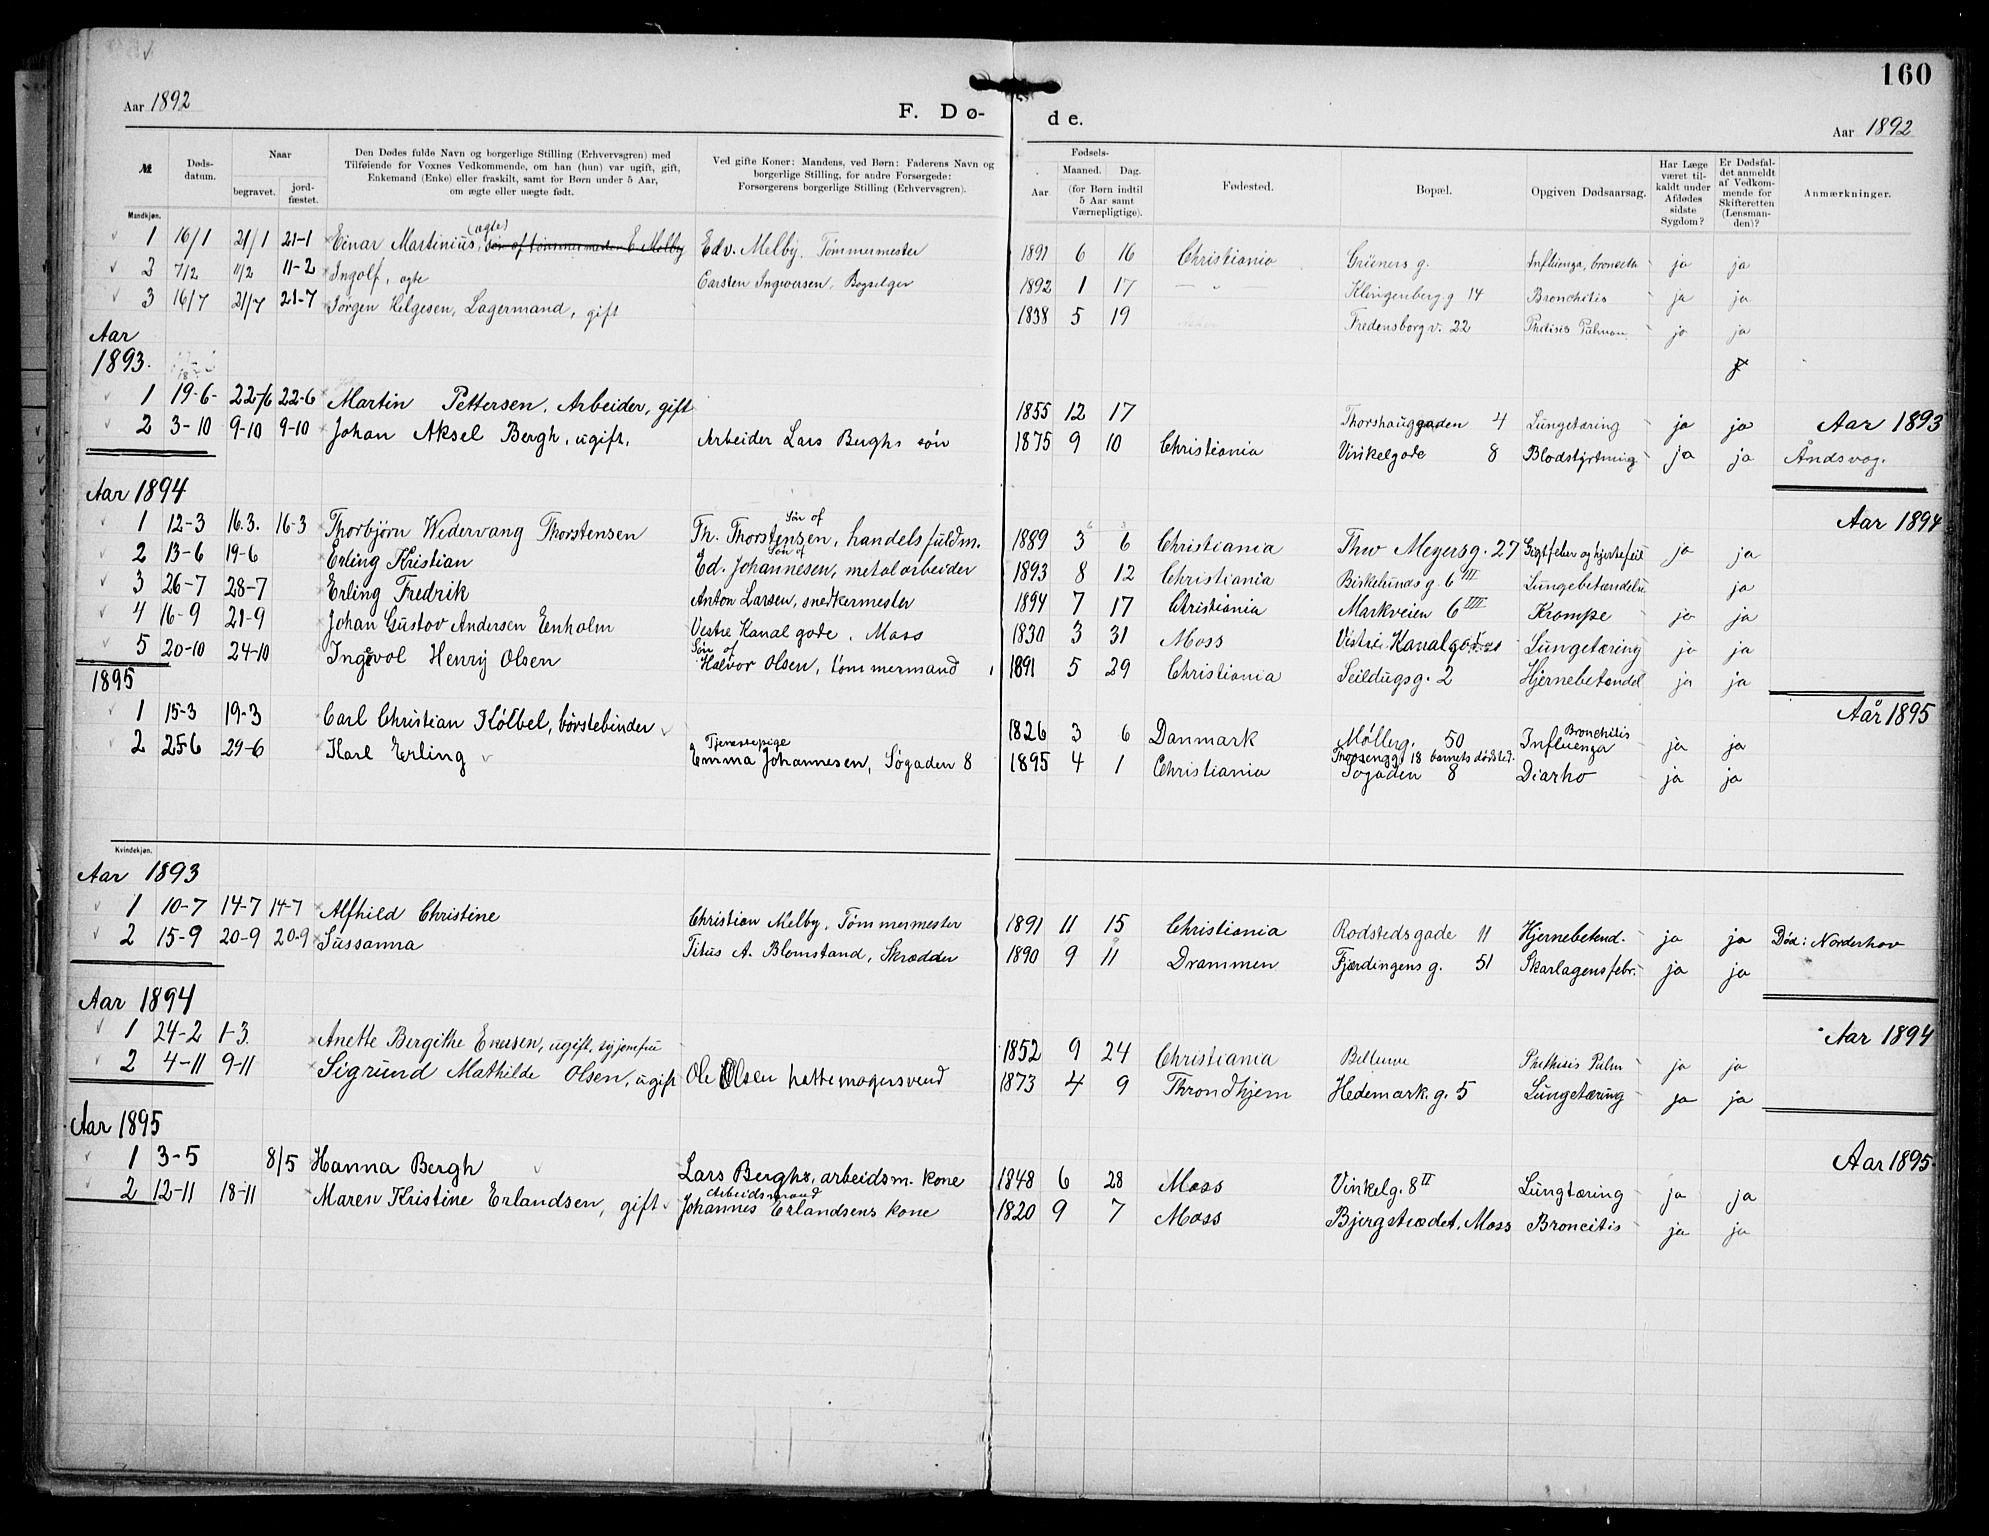 SAO, Den katolsk apostoliske menighet i Oslo , F/Fa/L0002: Dissenterprotokoll nr. 2, 1892-1937, s. 160